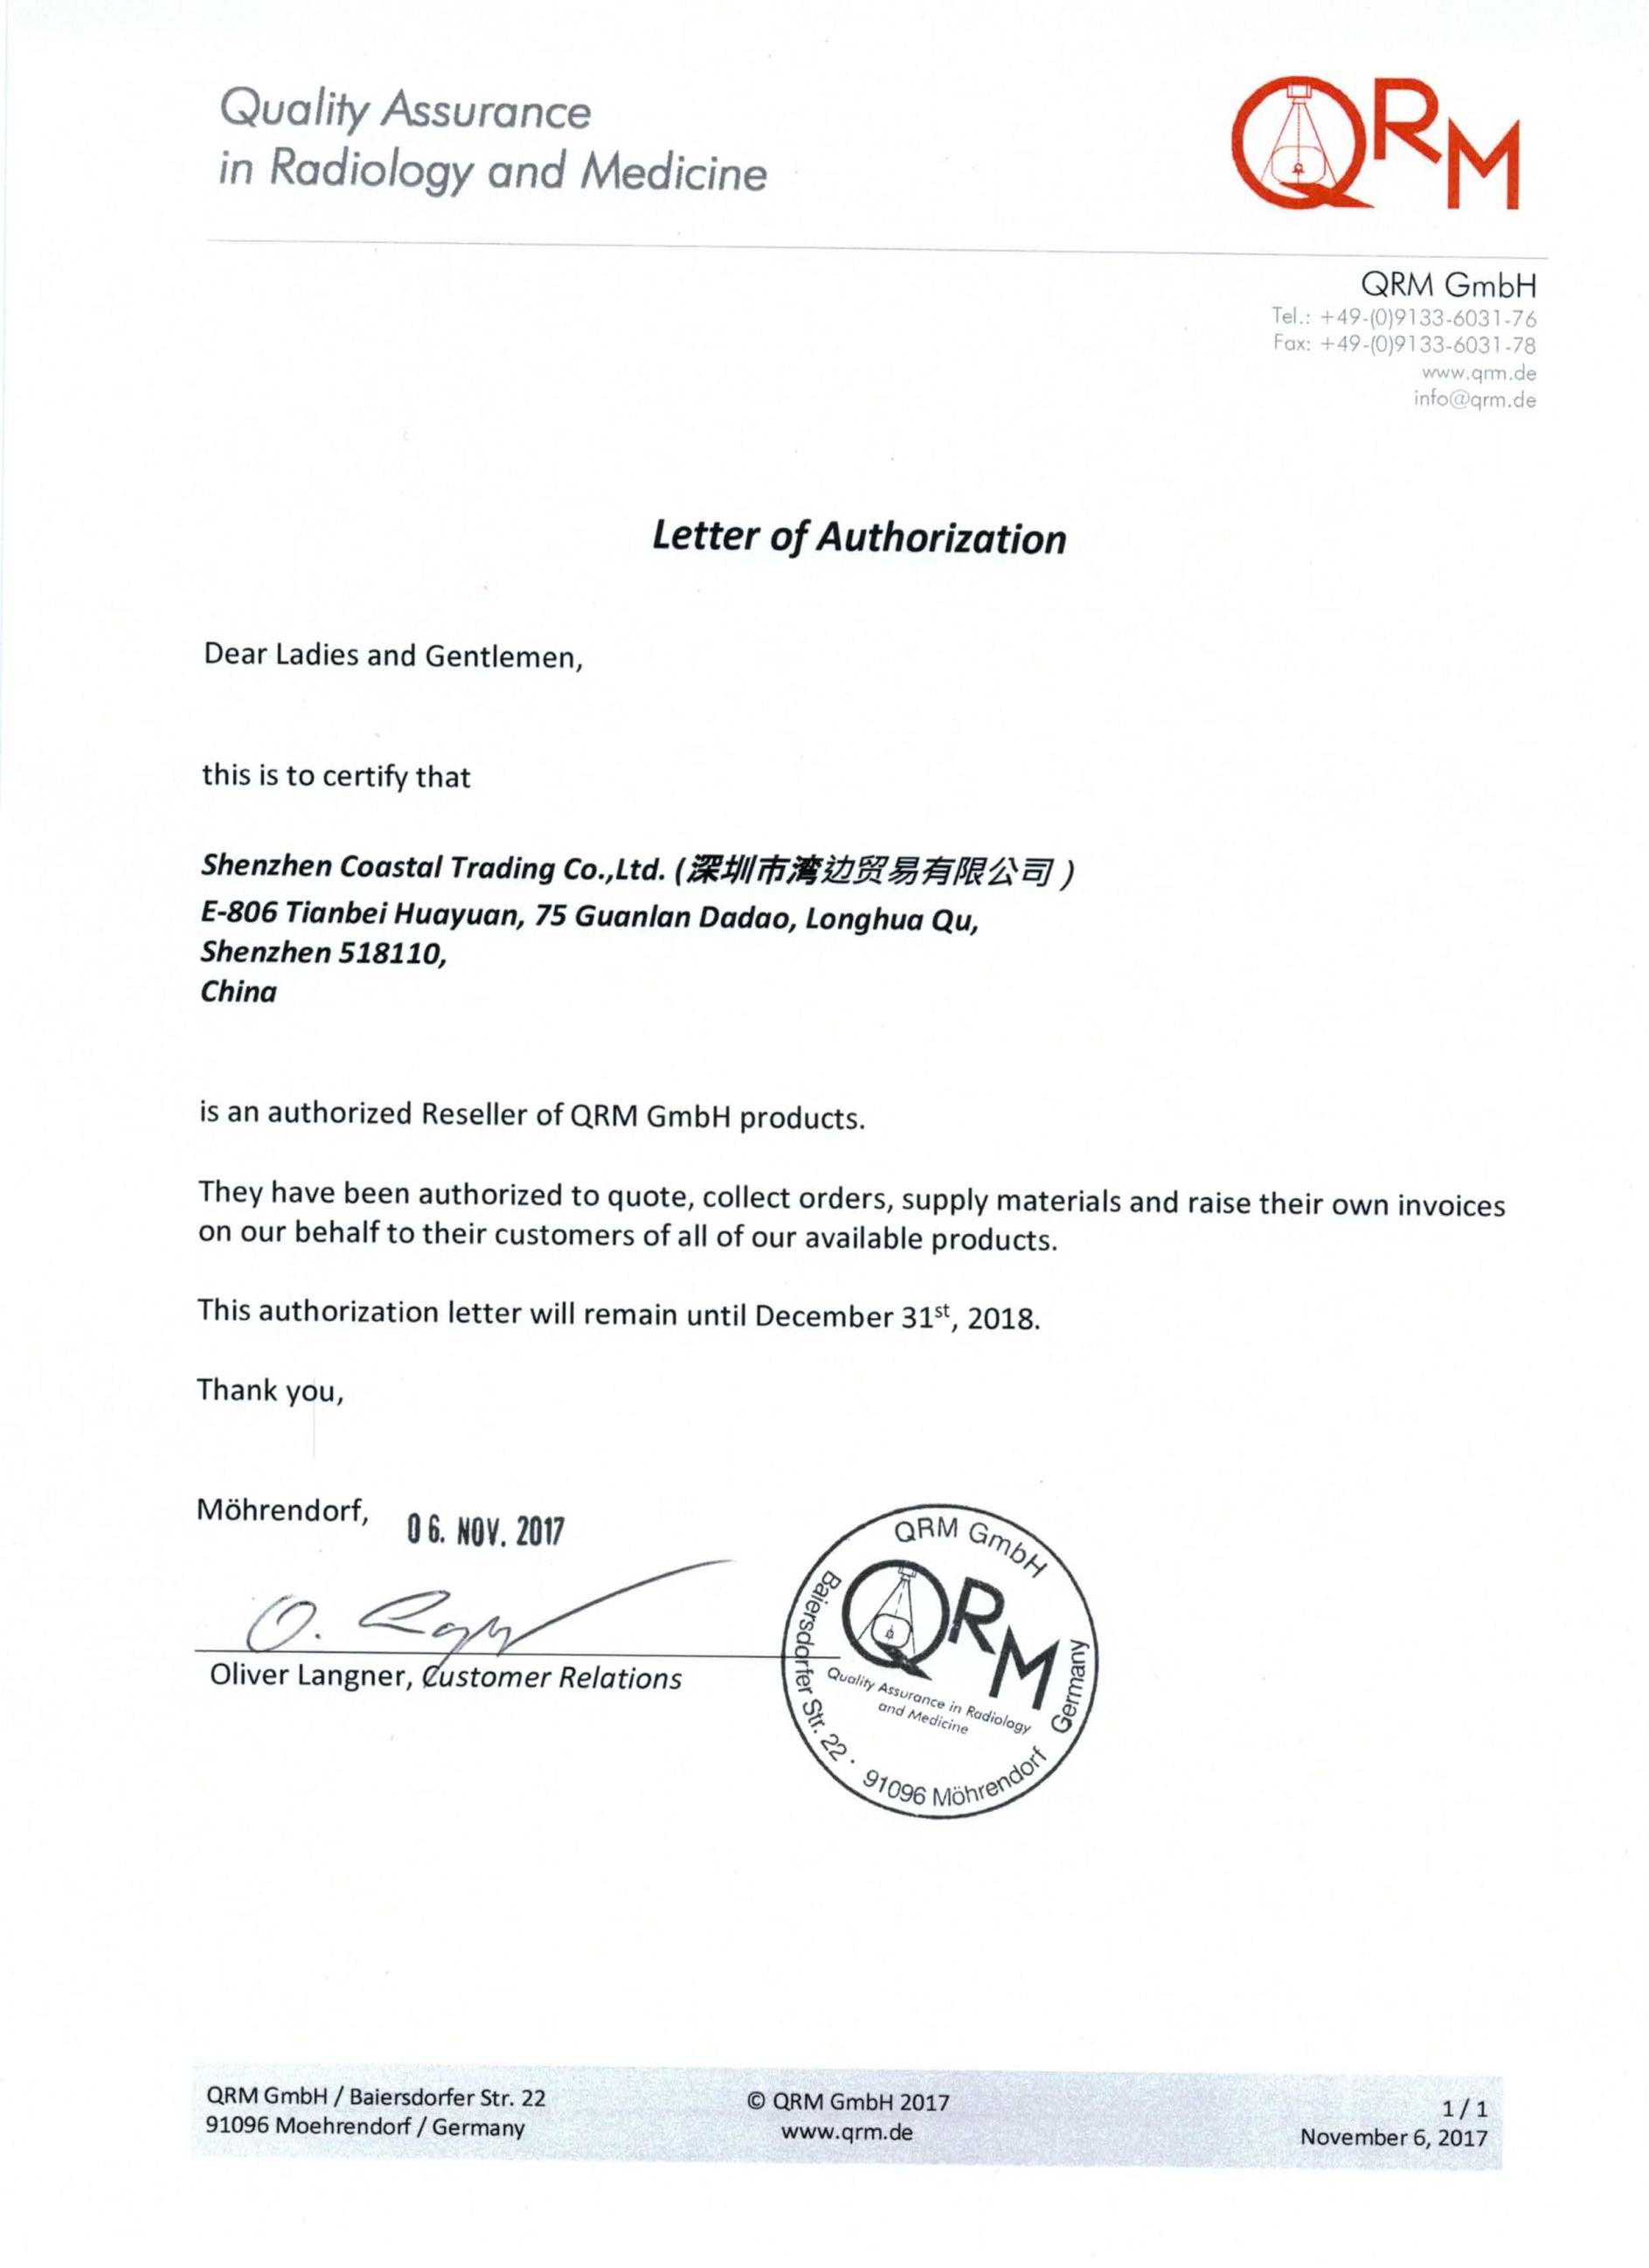 <p> 德国QRM授权证书 </p>